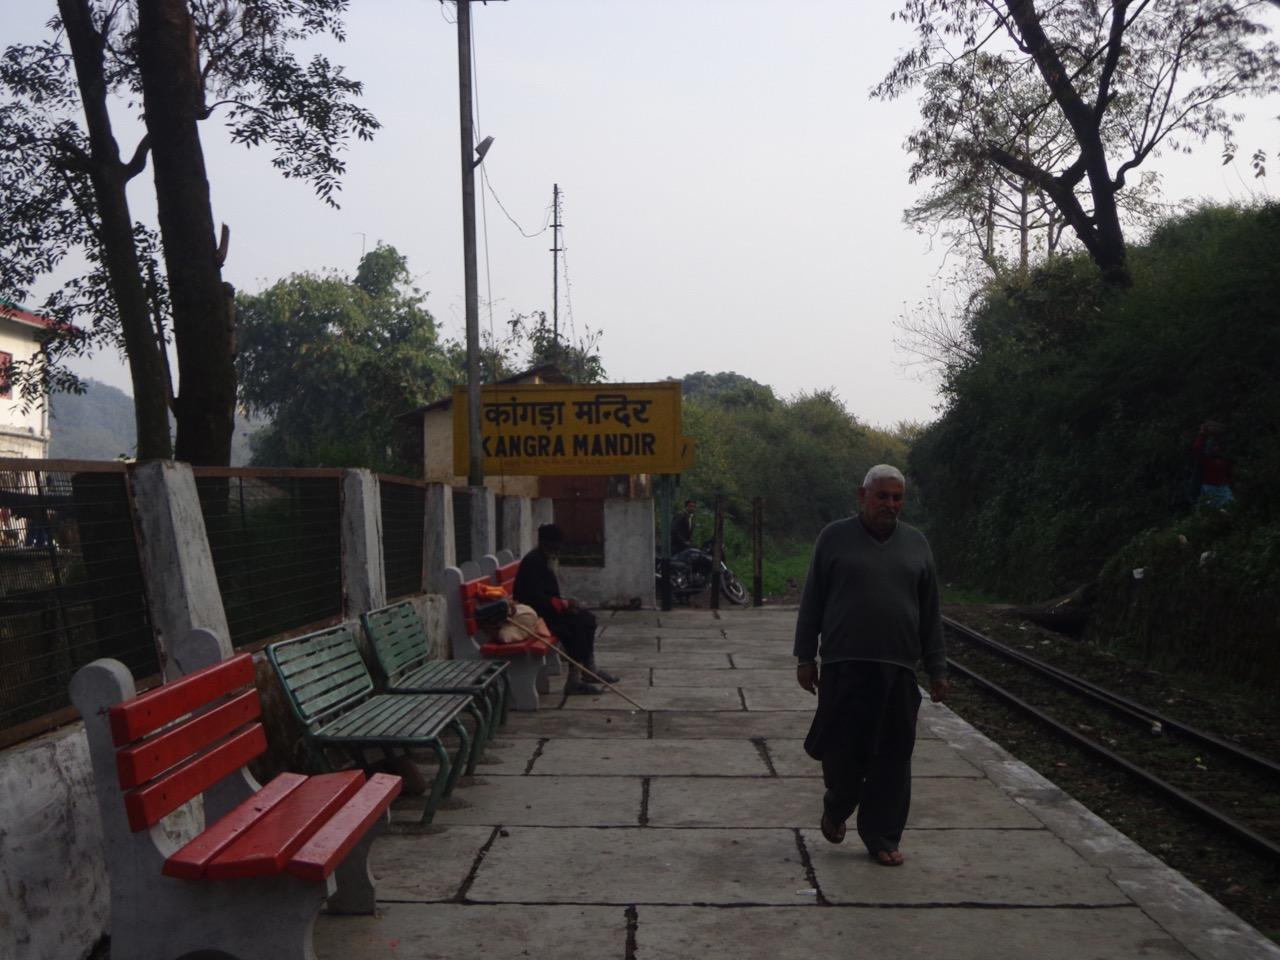 Kangra Mandir station.